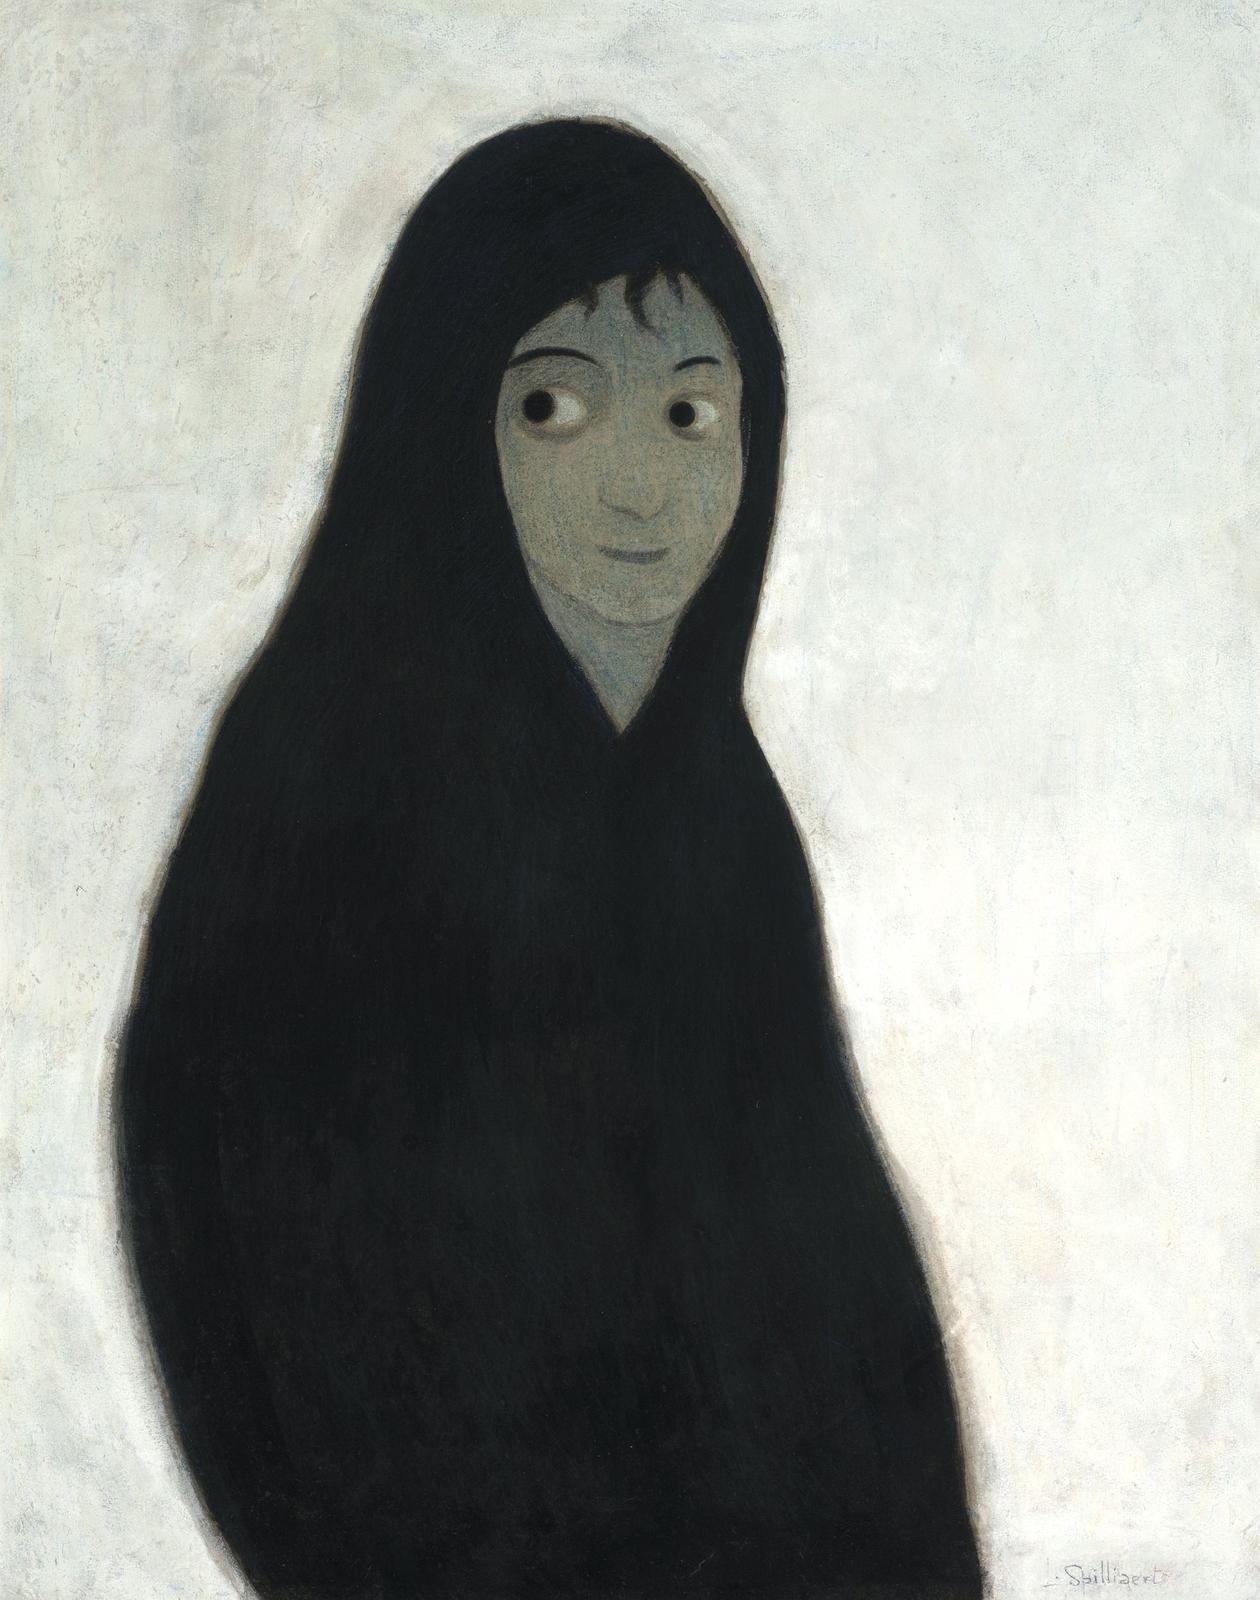 1913_Жена рыбака в черном платке на снегу (Wife of a fisherman in the black shawl in the snow)_89.5 х 70.5_бумага, пастель, тушь, цветные карандаши и мел.jpg